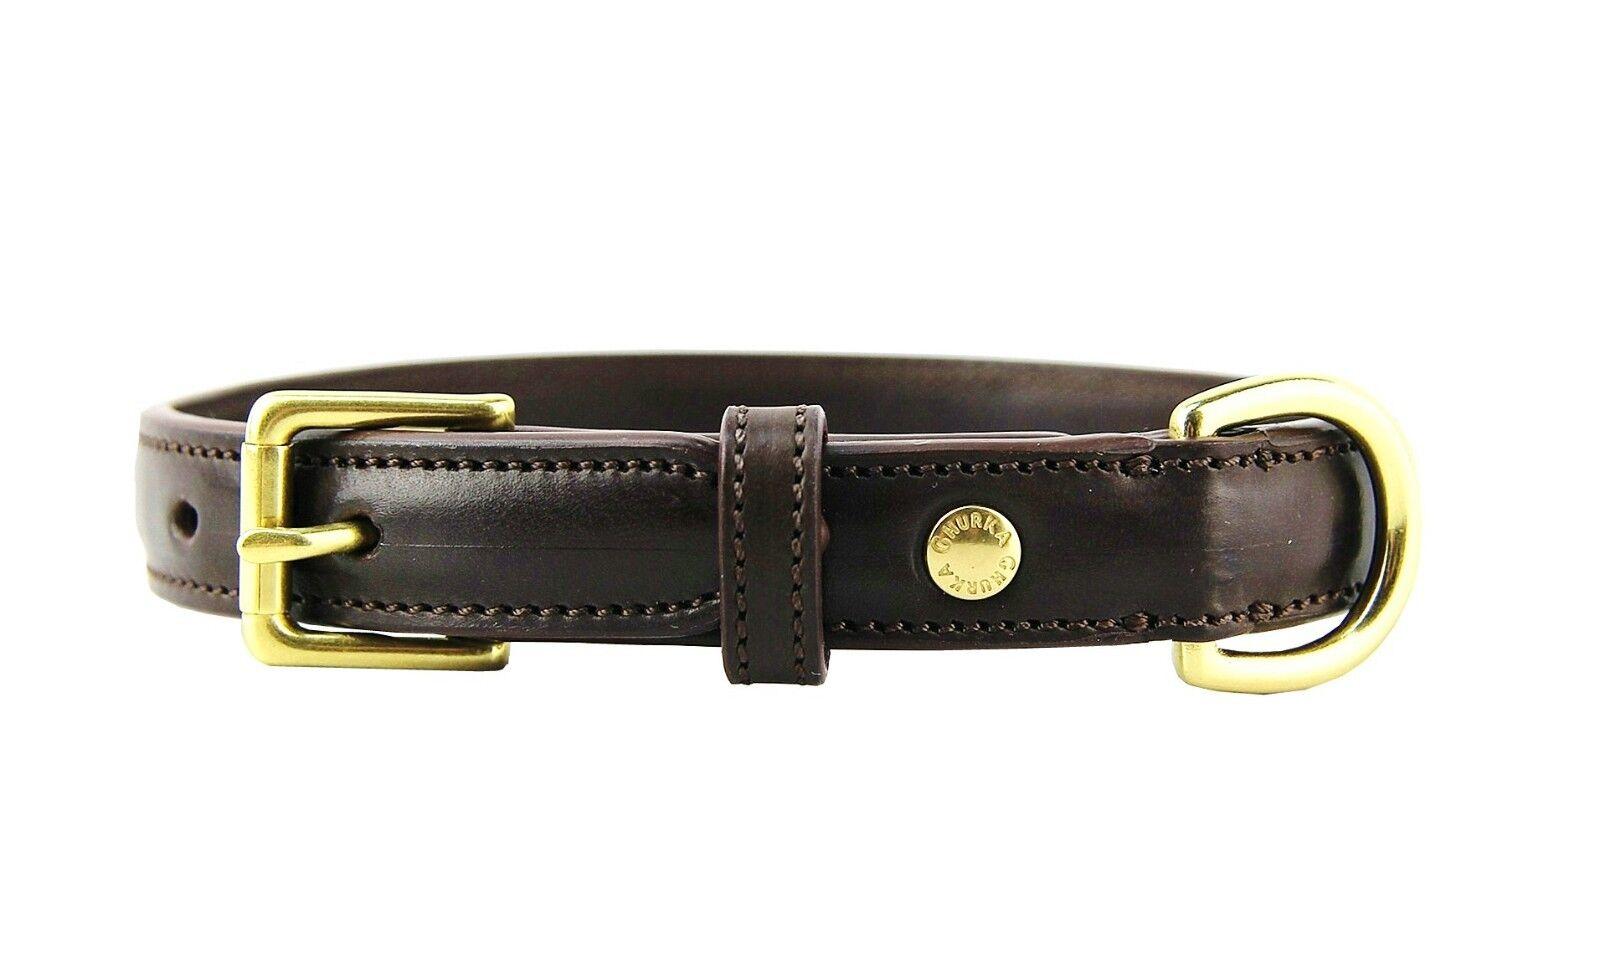 compra meglio GHURKA GHURKA GHURKA 100% LEATHER DOG COLLAR FOR SMALL BREED WALNUT .75  WIDE 16.5  LONG NEW  negozio online